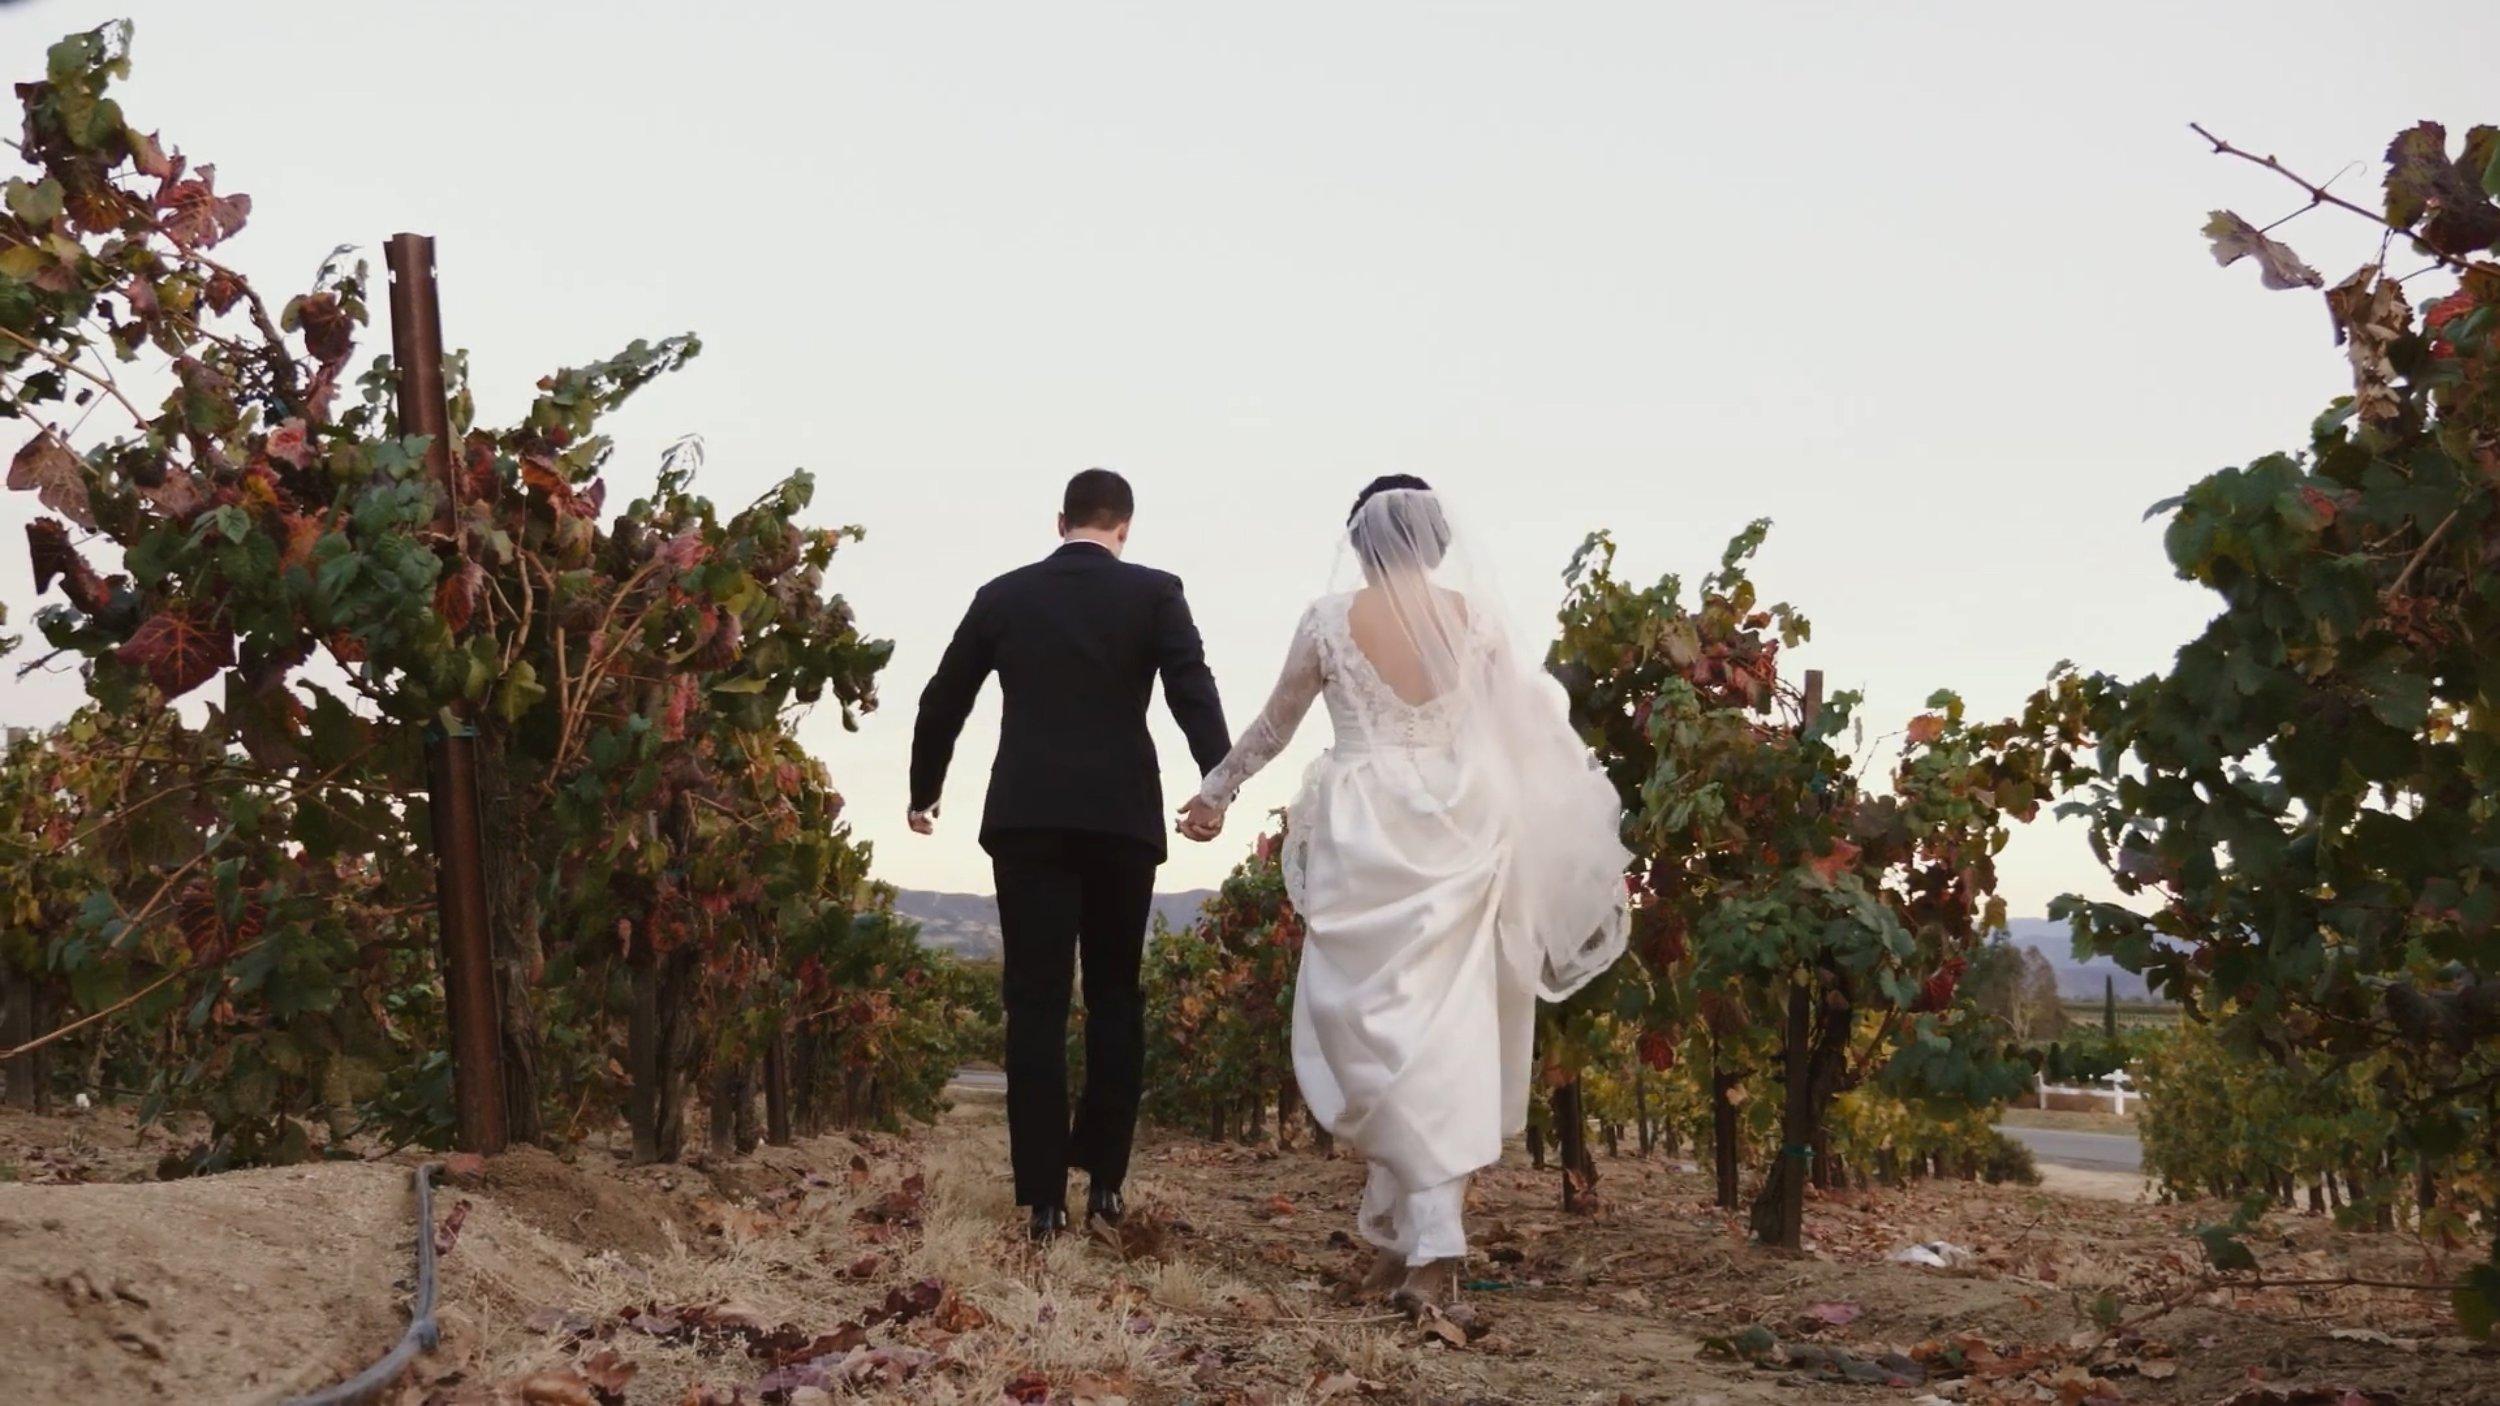 Strolling through the vinyard.jpg